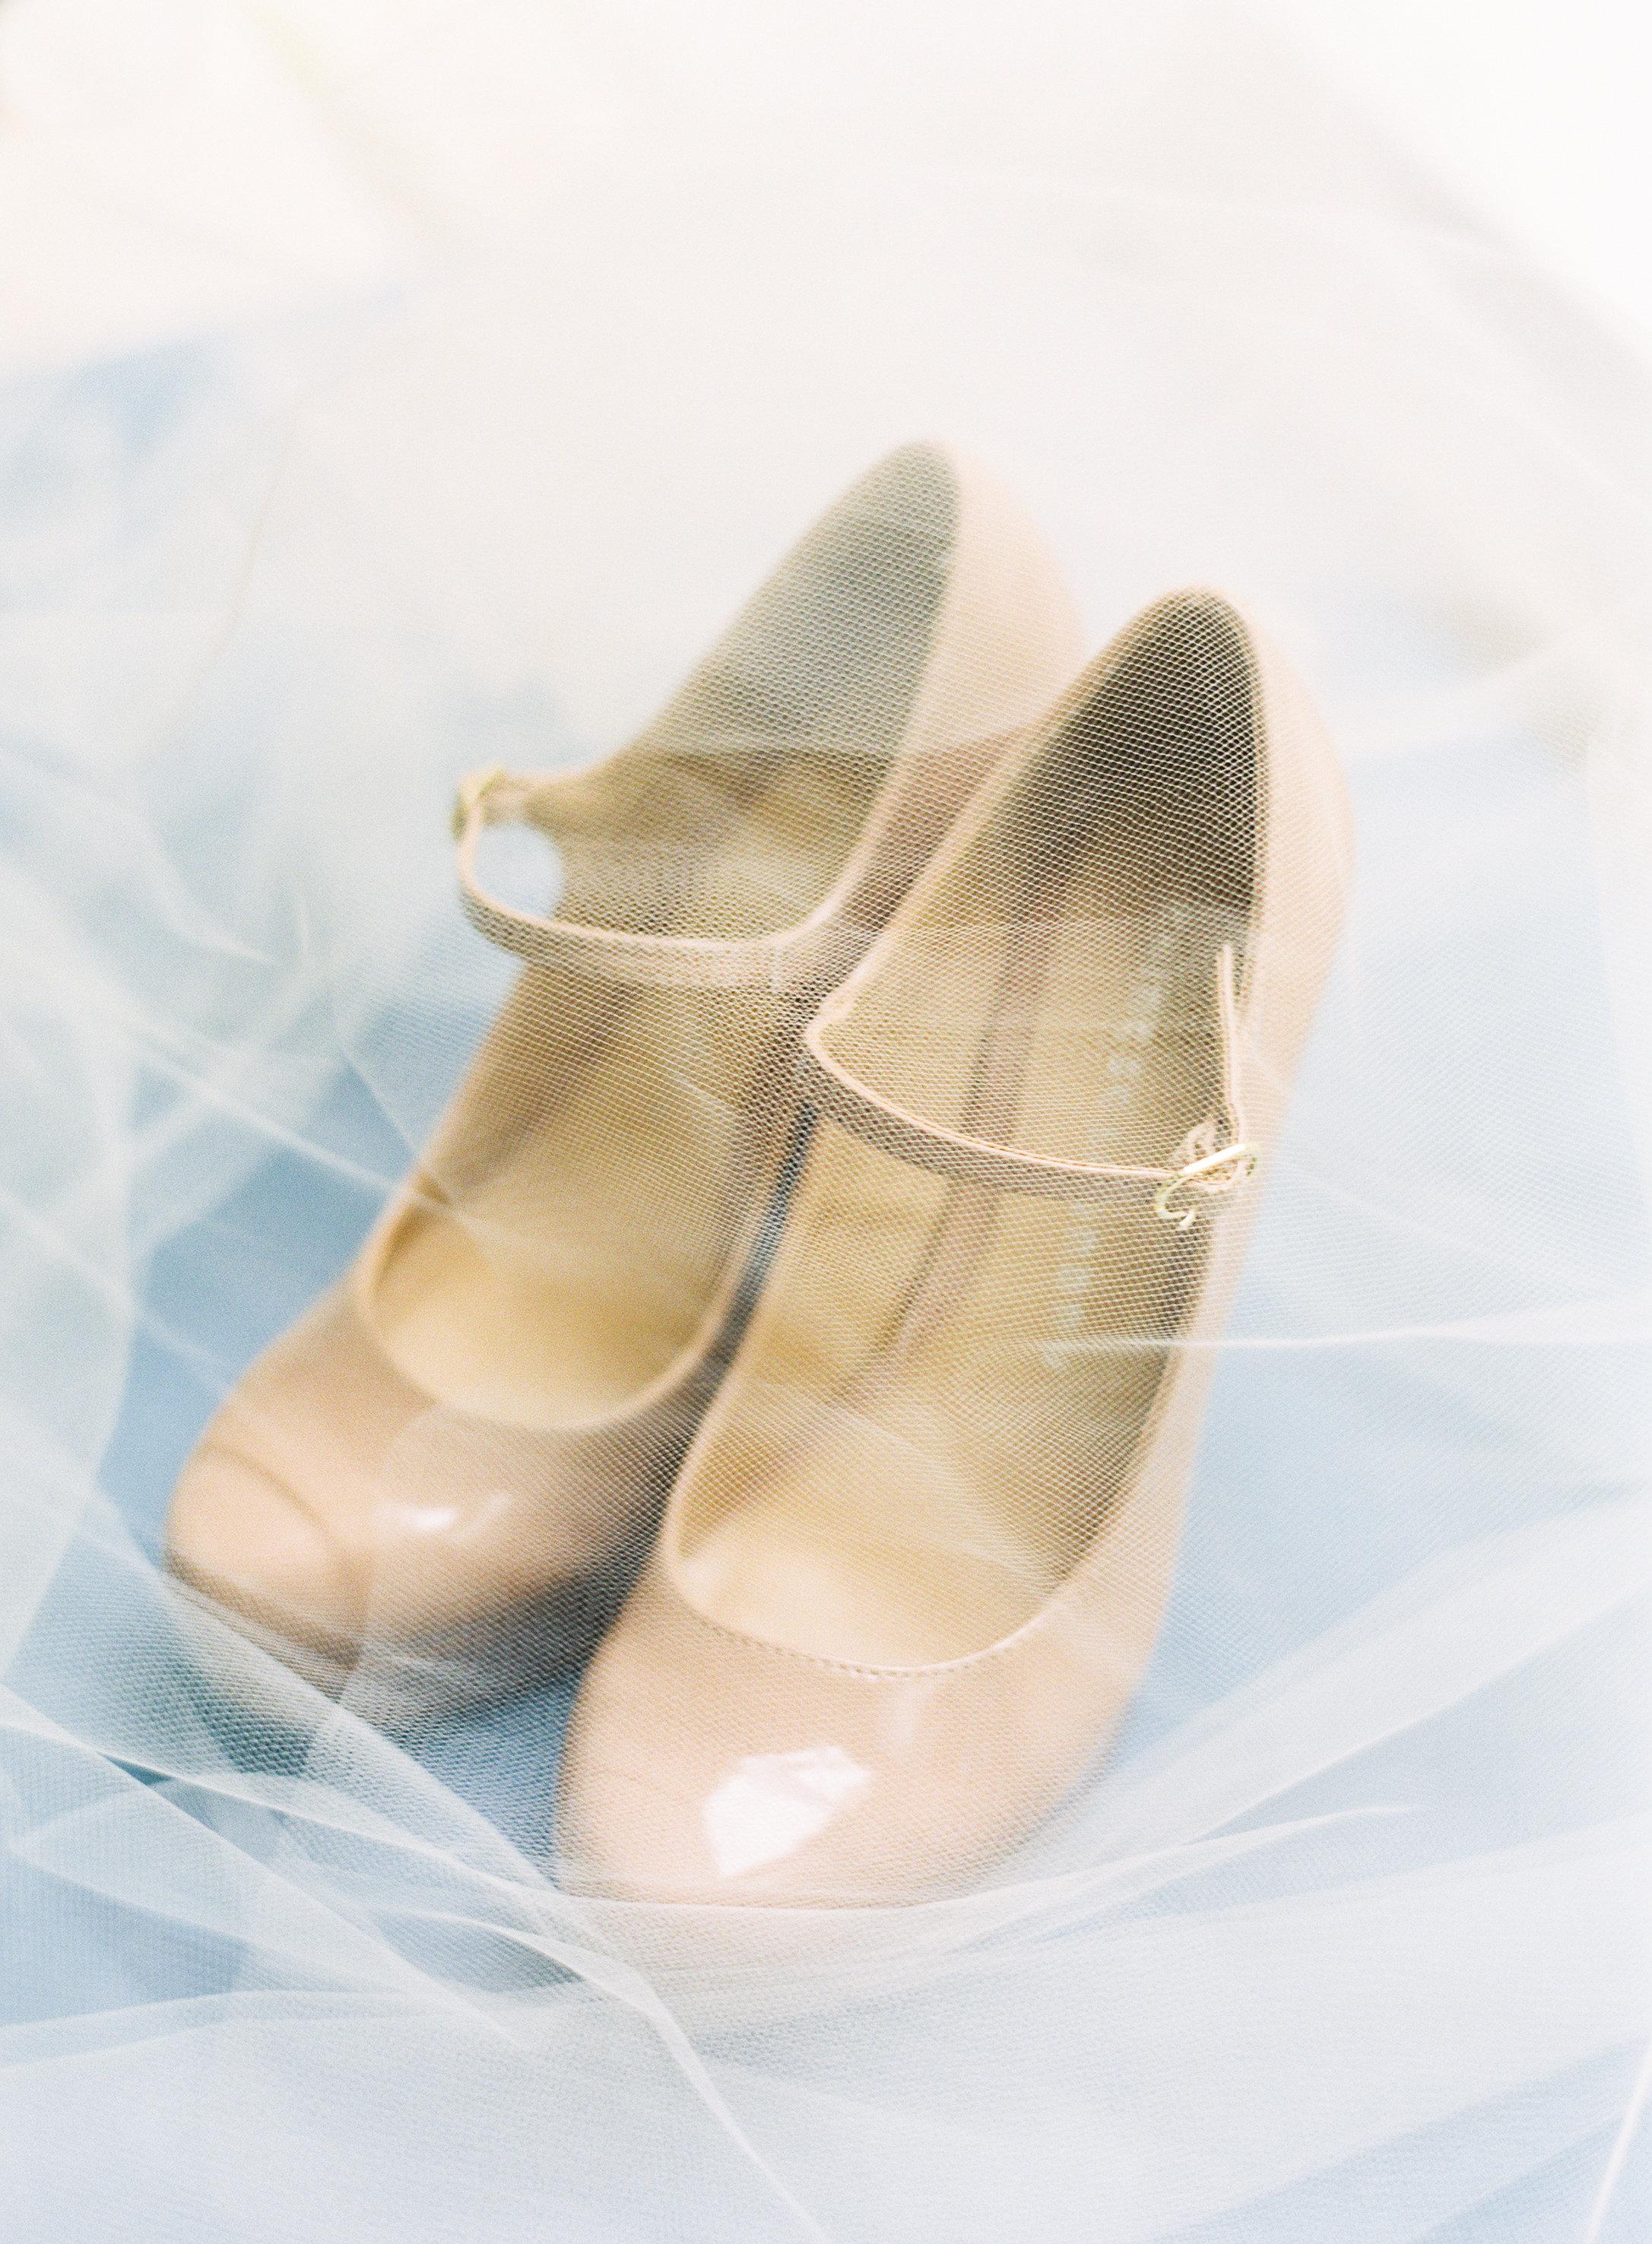 JA_Wedding_Getting_Ready_005.jpg